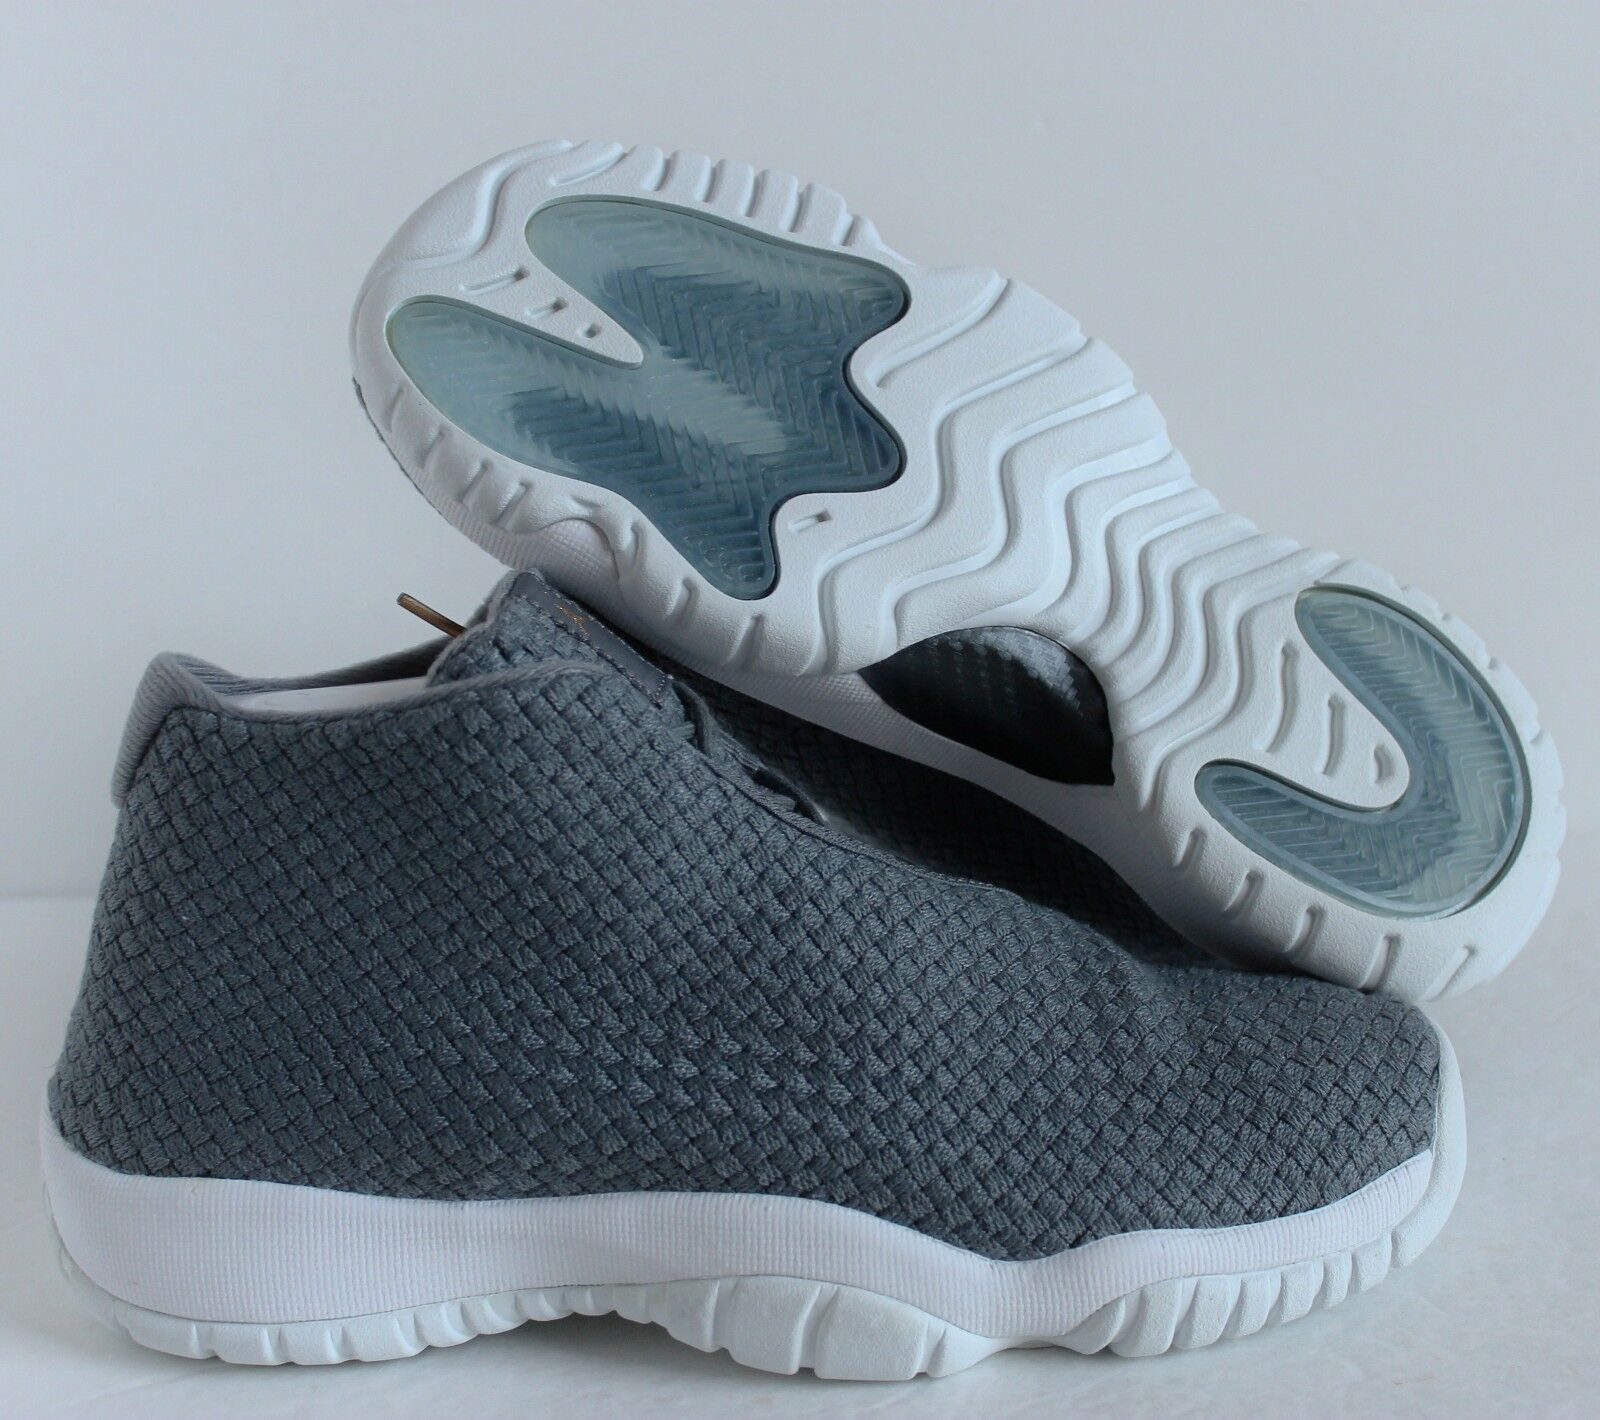 NIKE AIR JORDAN FUTURE BG COOL gris- gris- gris- blanc SZ 6Y // femmes SZ 7.5 [656504-003] 3fbab3